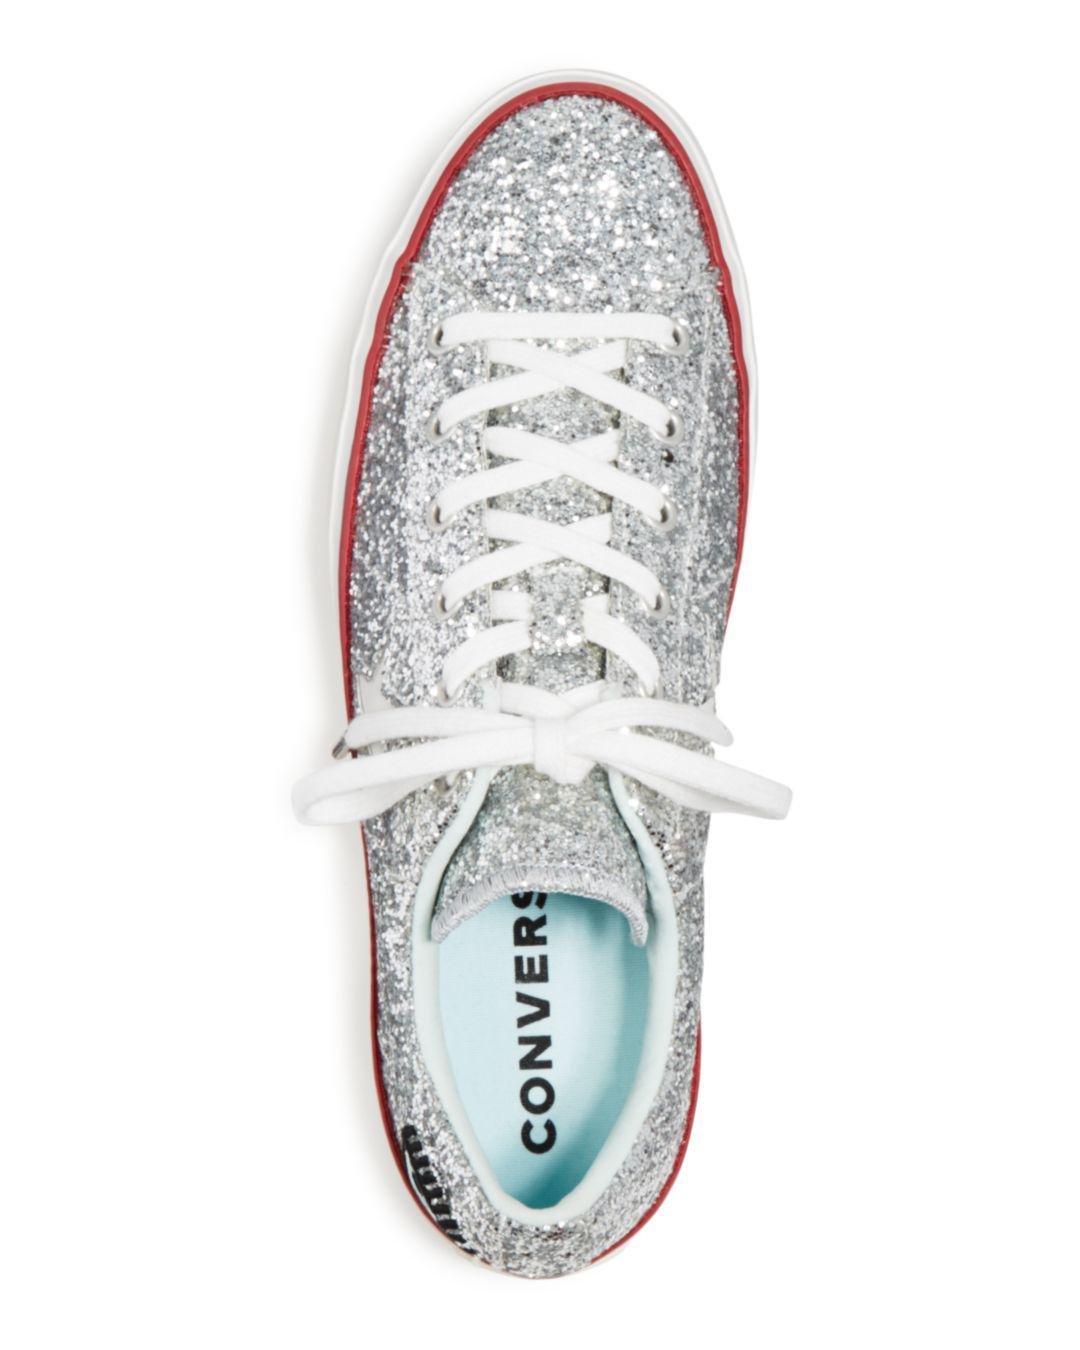 Converse Women's One Star Platform X Chiara Ferragni Glitter ...